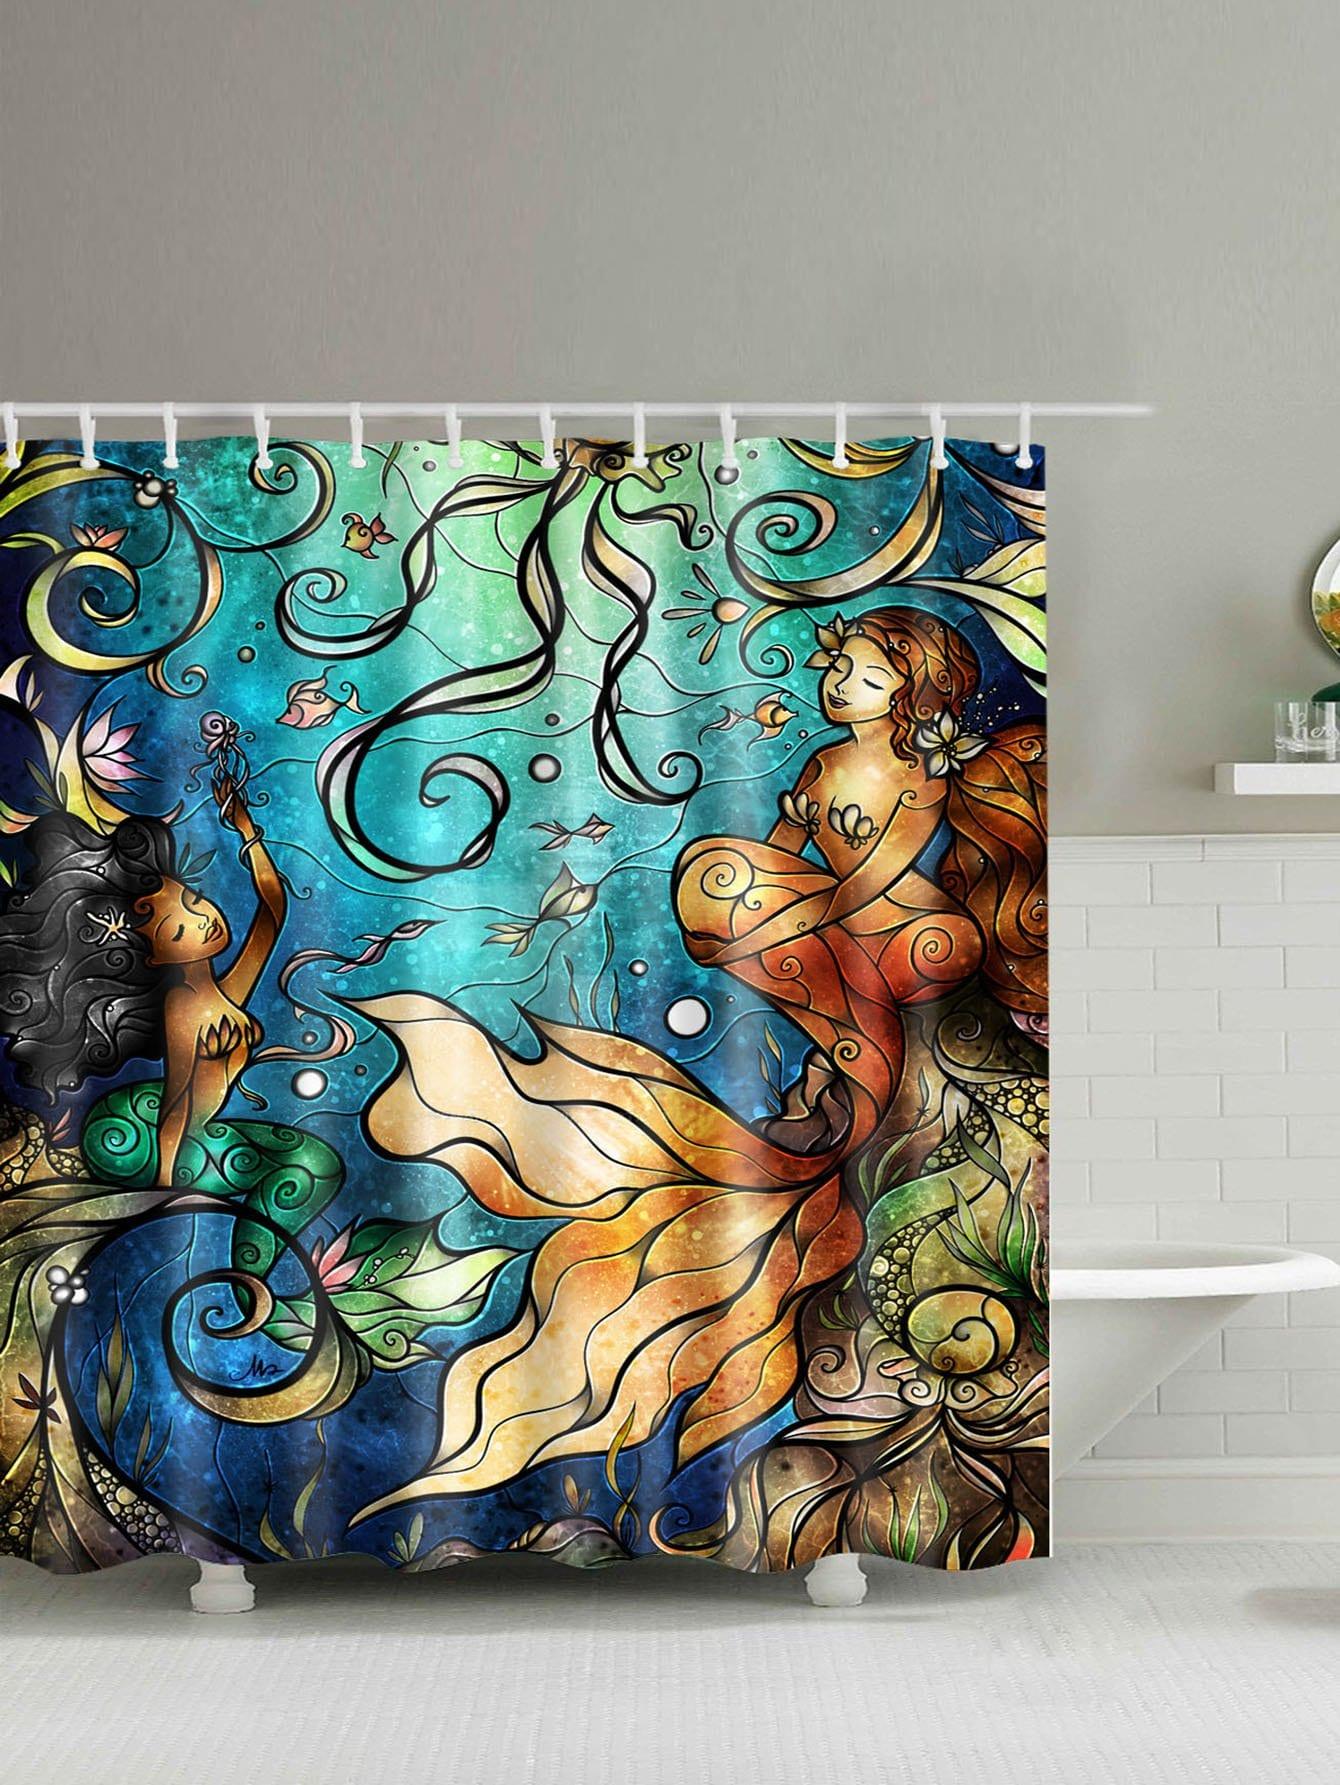 Mermaid Shower Curtain With Hook 12pcs geometric shower curtain with 12pcs hook